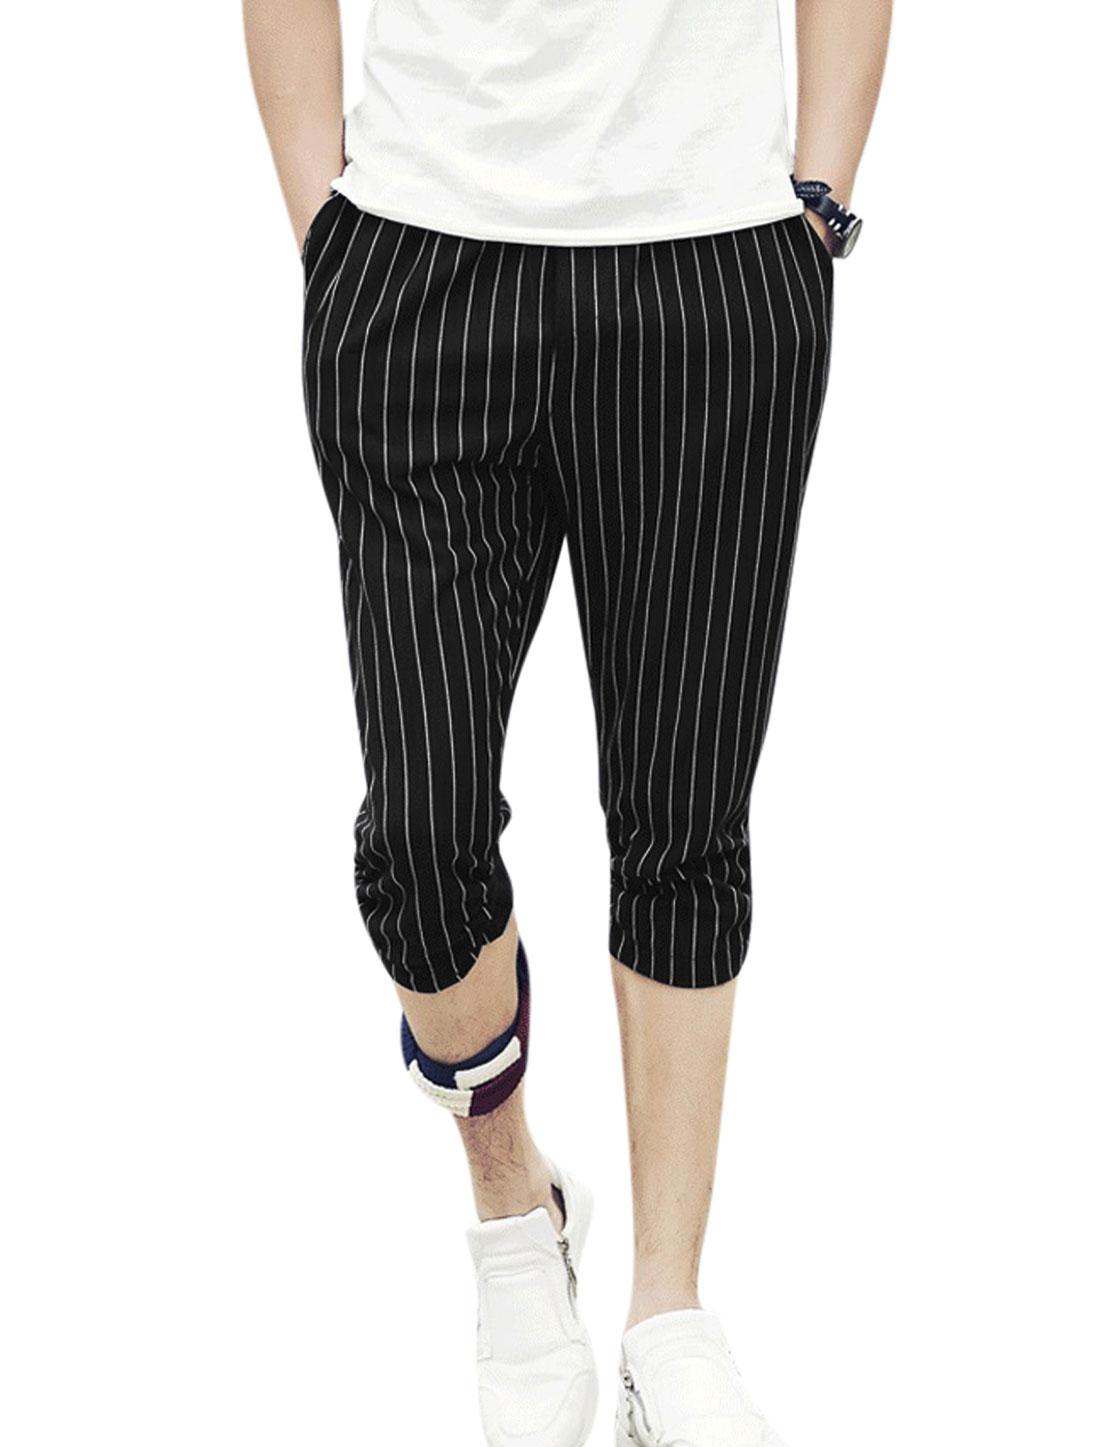 Men Drawstring Waist Stripes Print Pockets Leisure Capris Pants Black W30